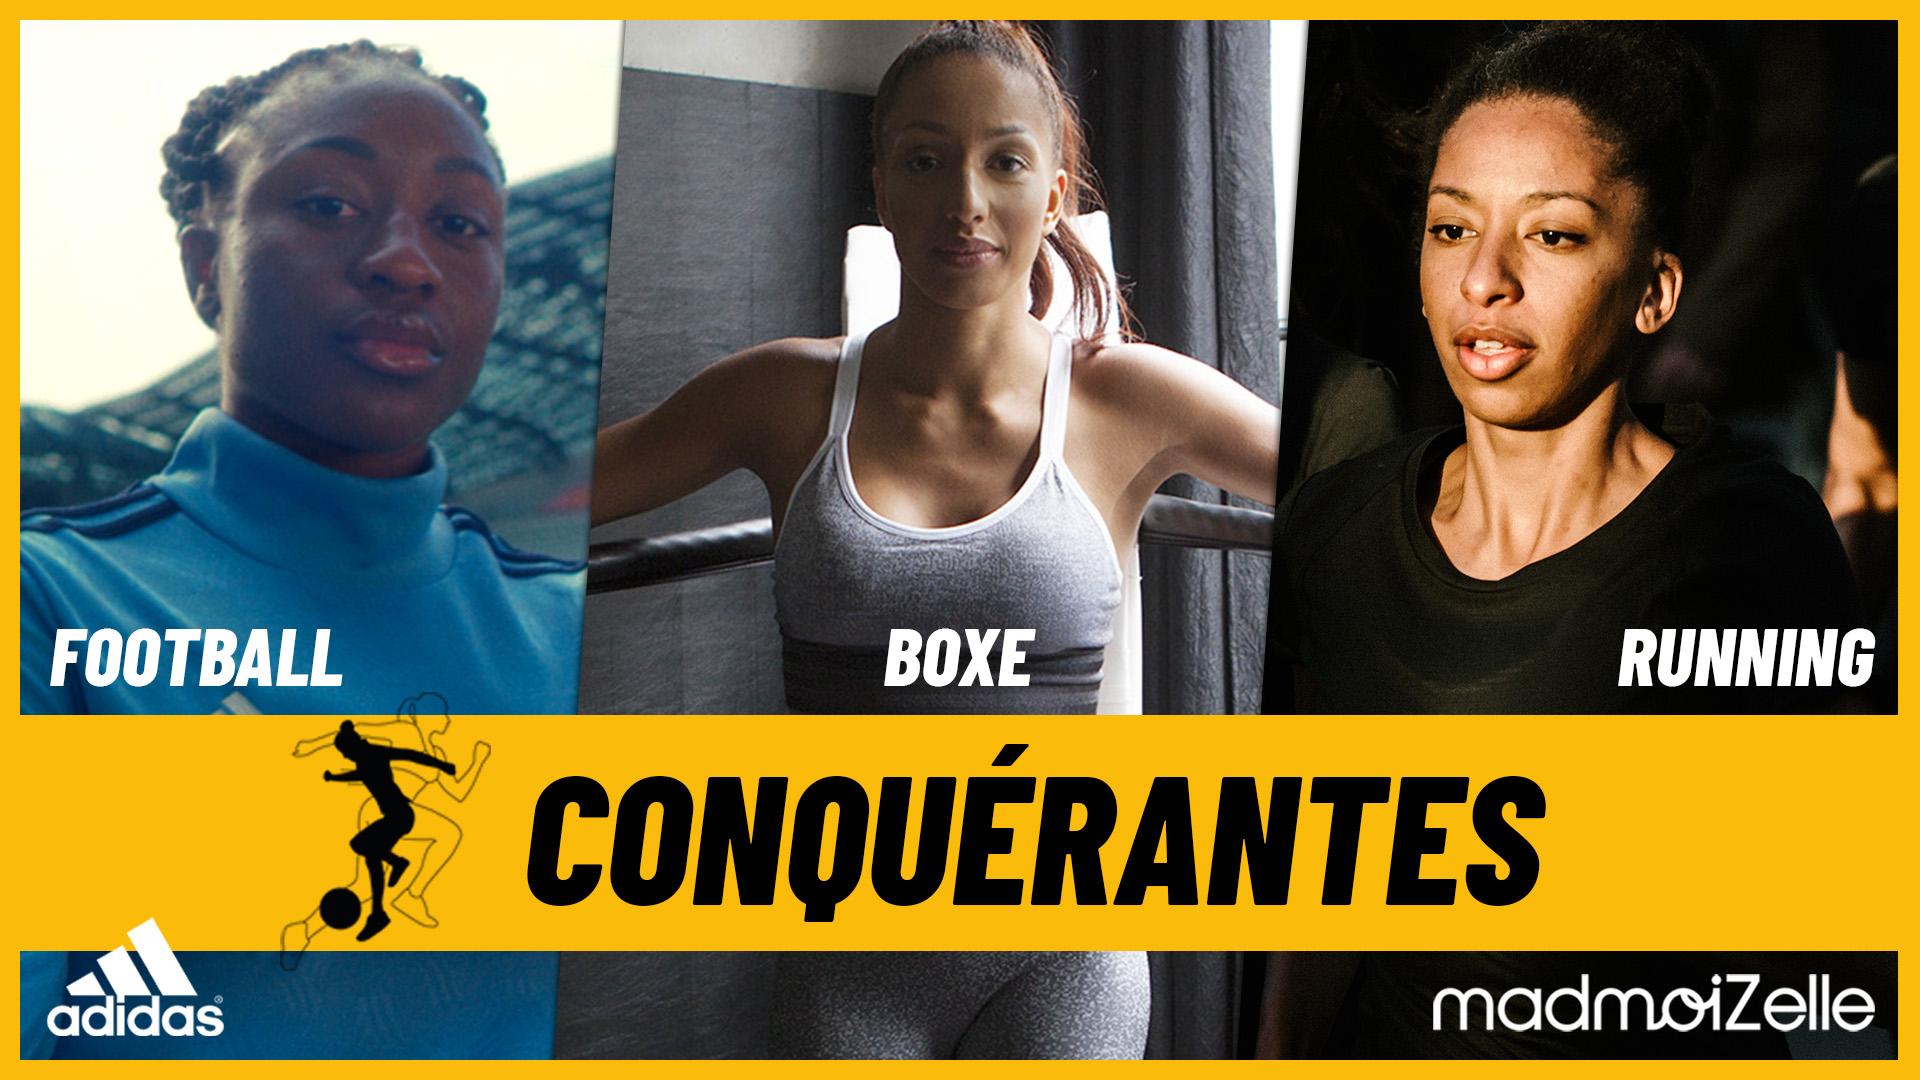 MadmoiZelle pour Adidas – Le podcast « Conquérantes